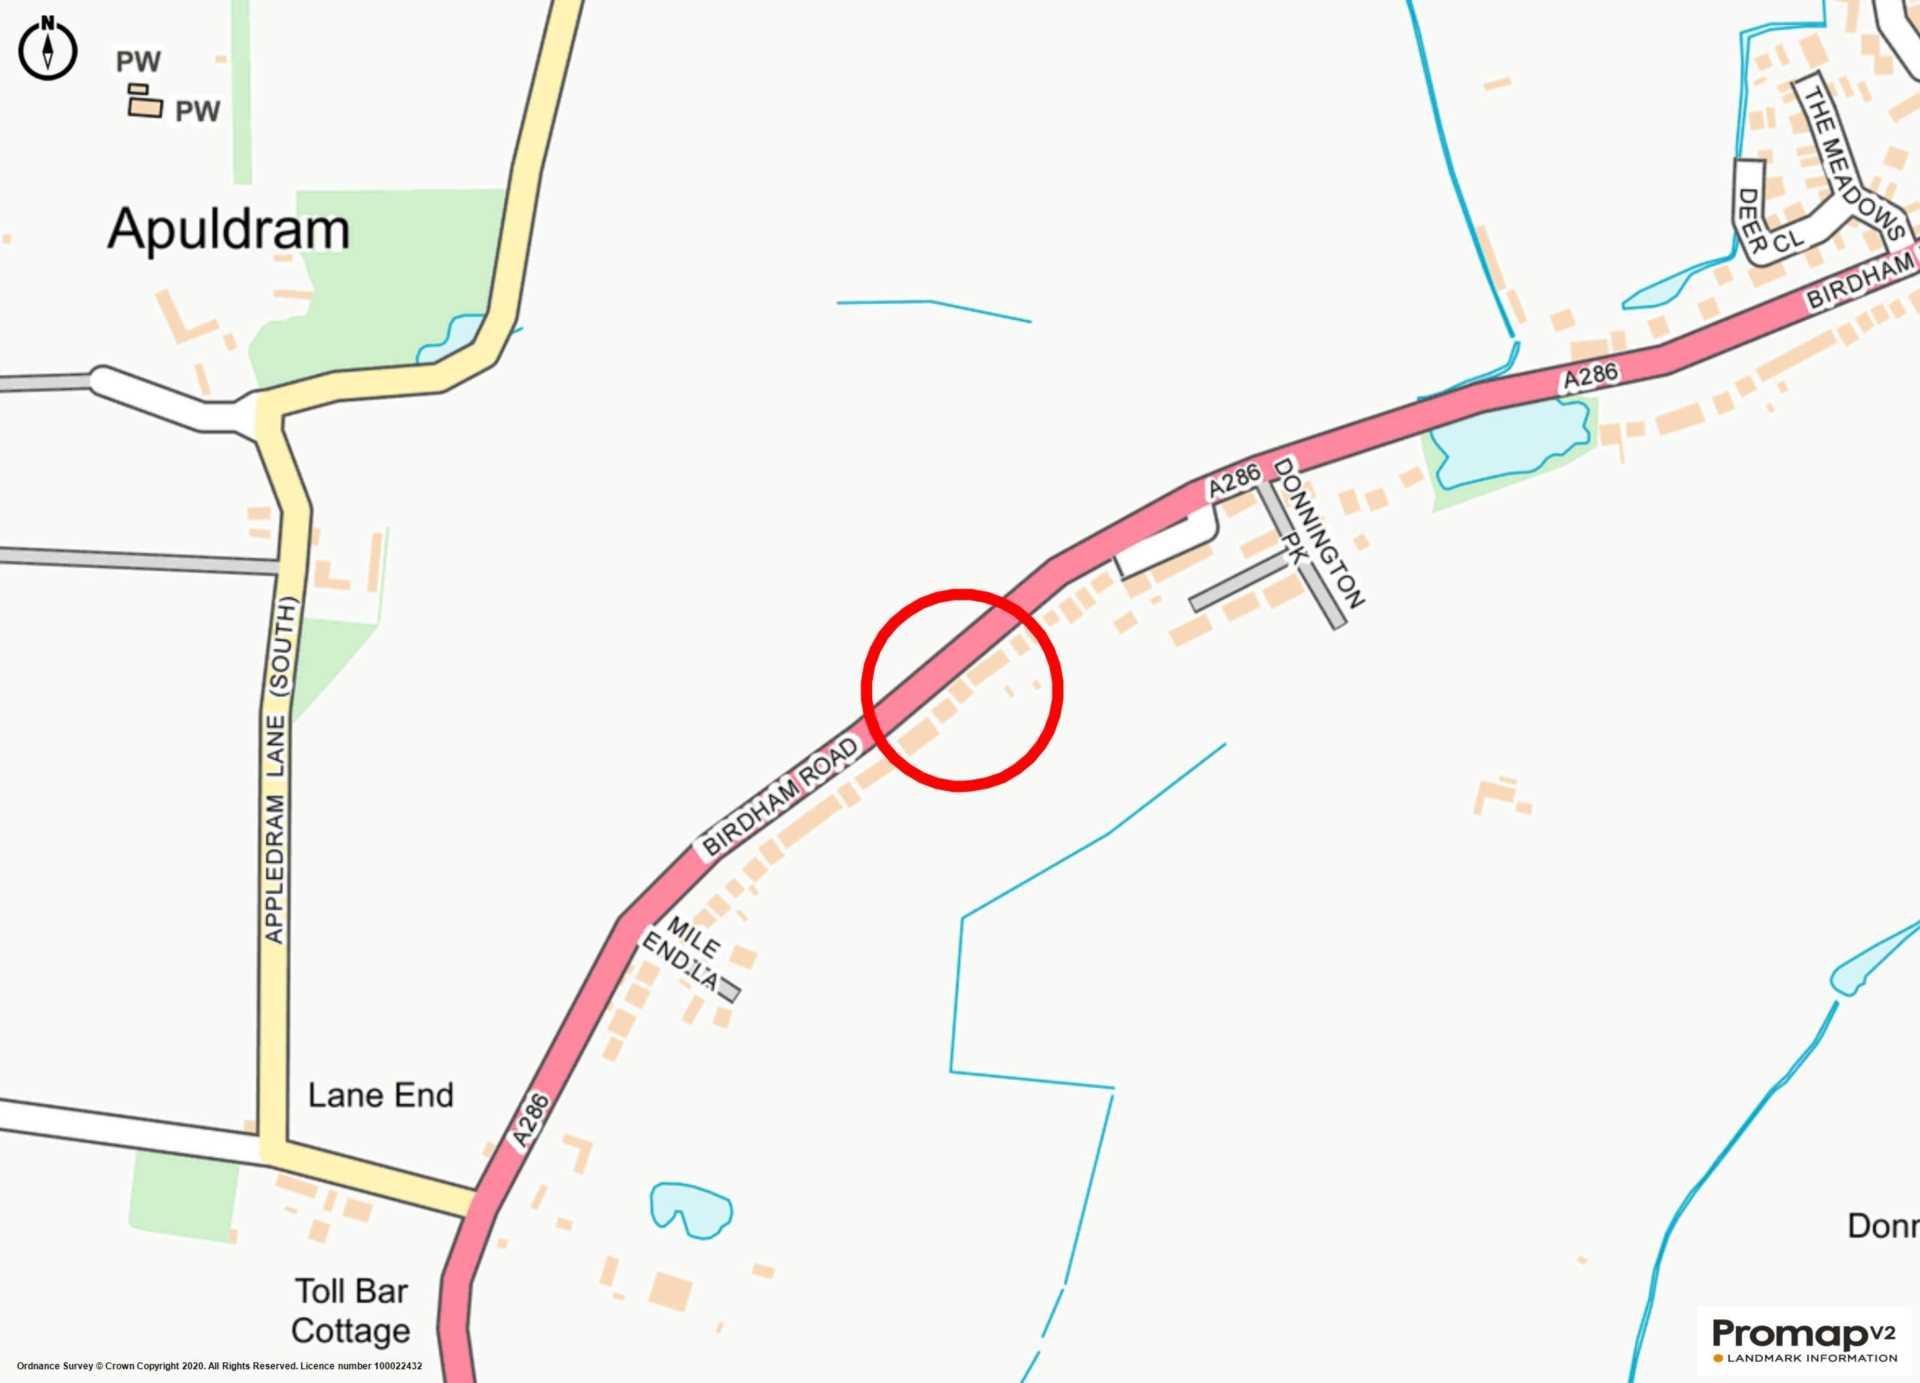 Birdham Road, Donnington, Chichester, Image 16